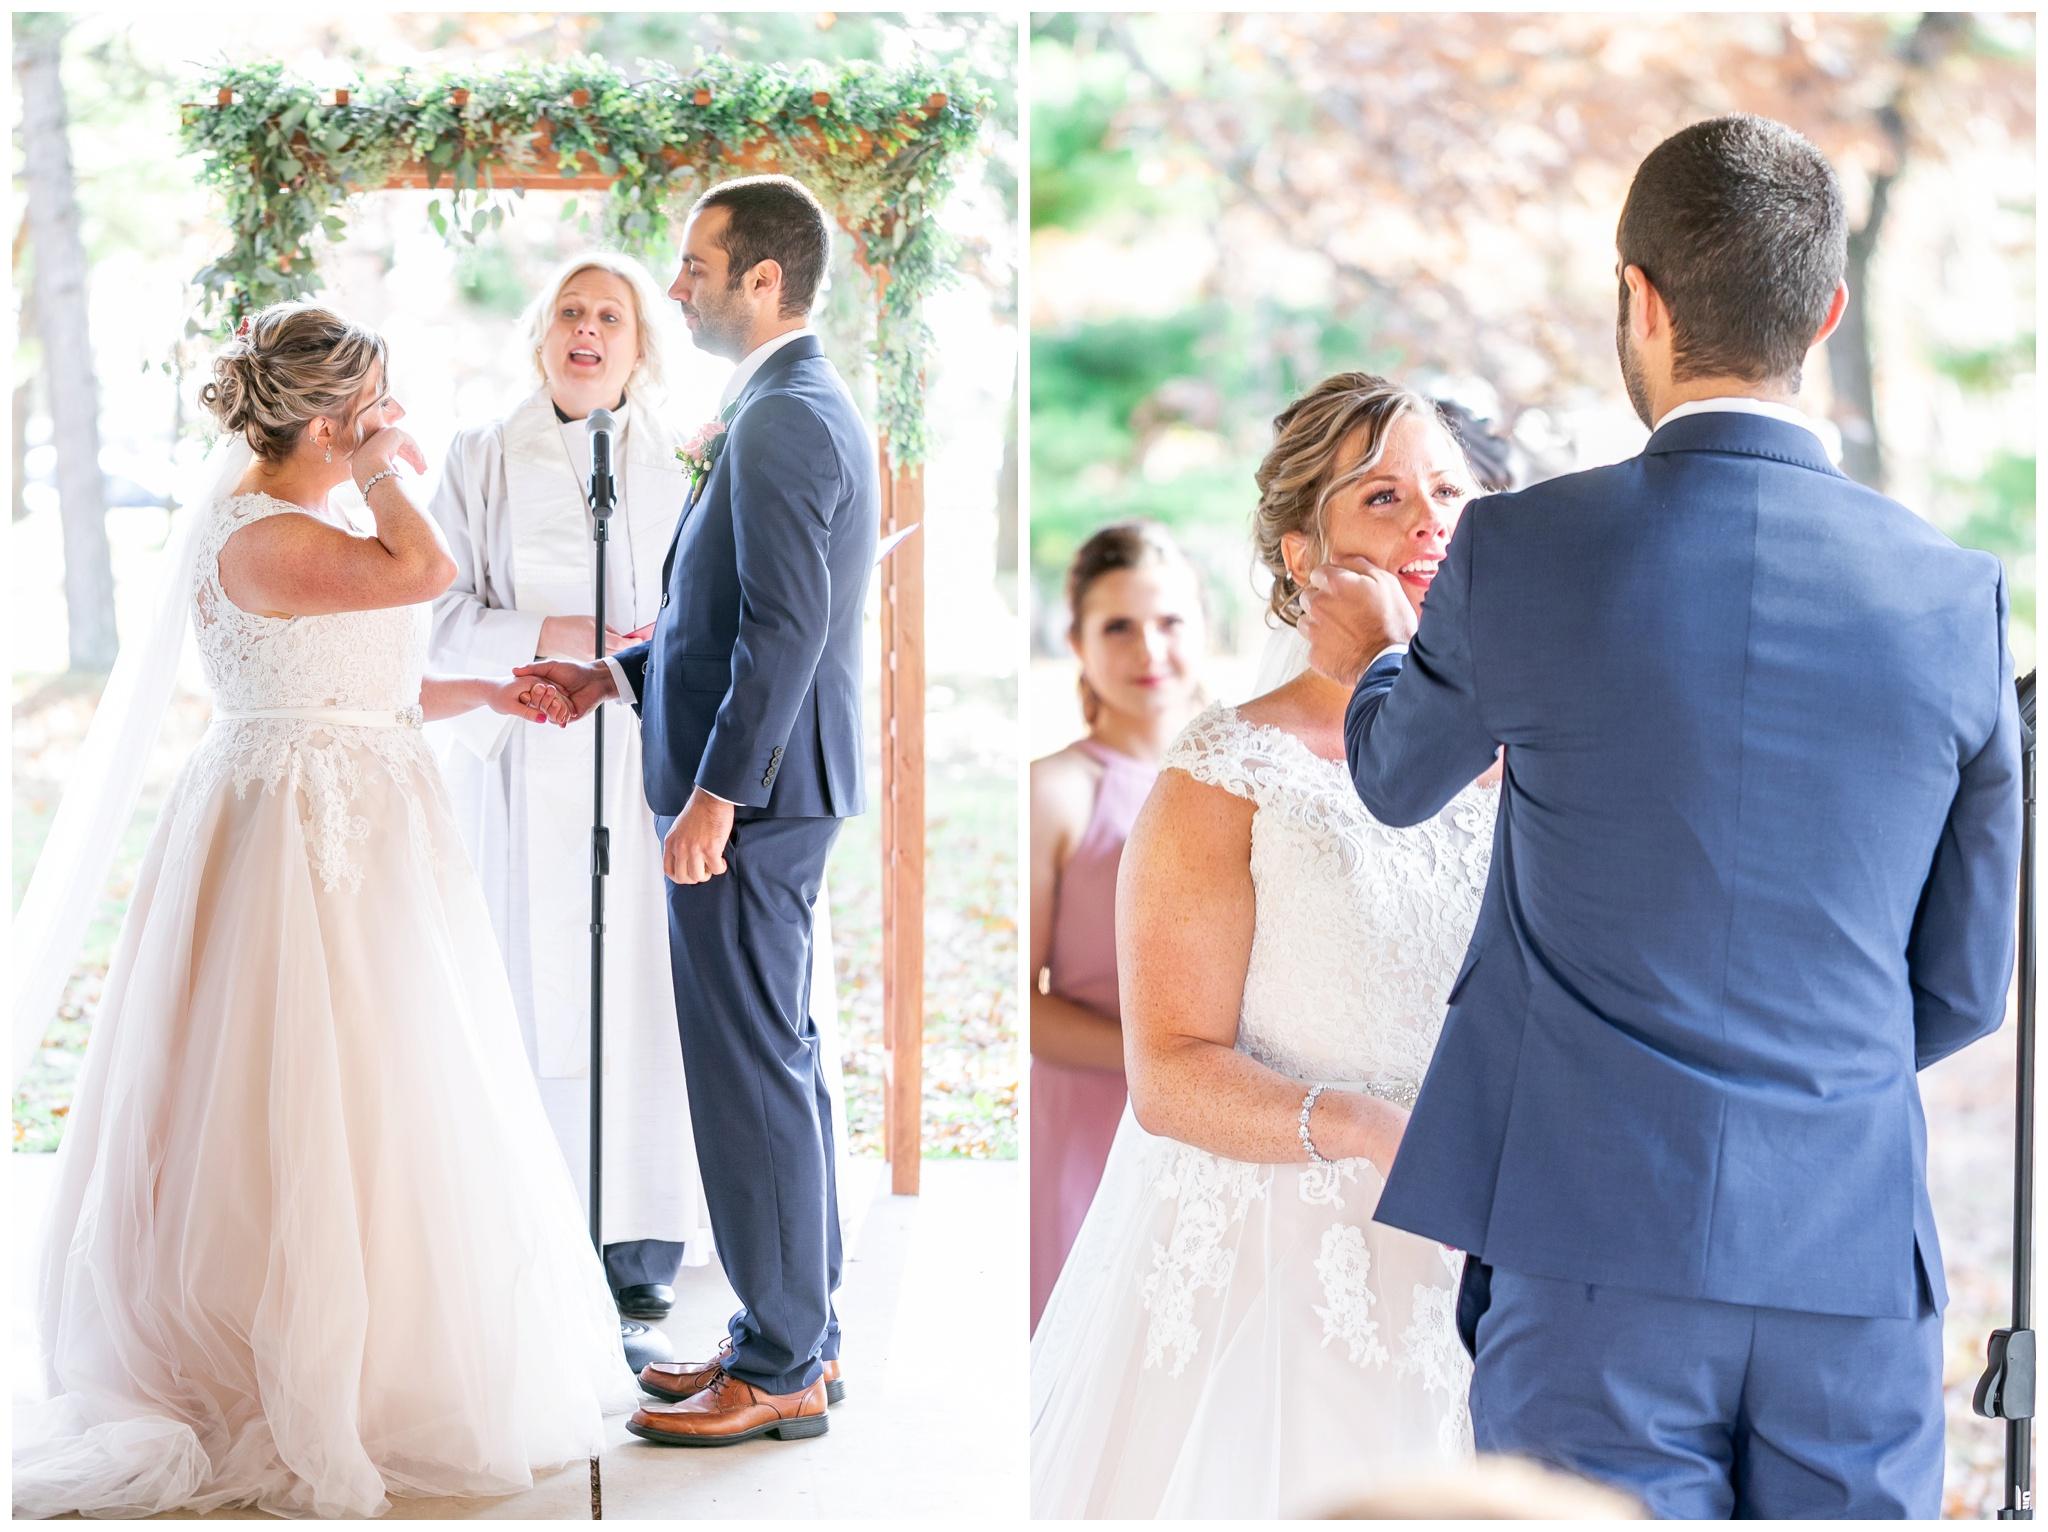 Shawano_County_park_Wedding_Caynay_Photo_Madison_Wi_2287.jpg